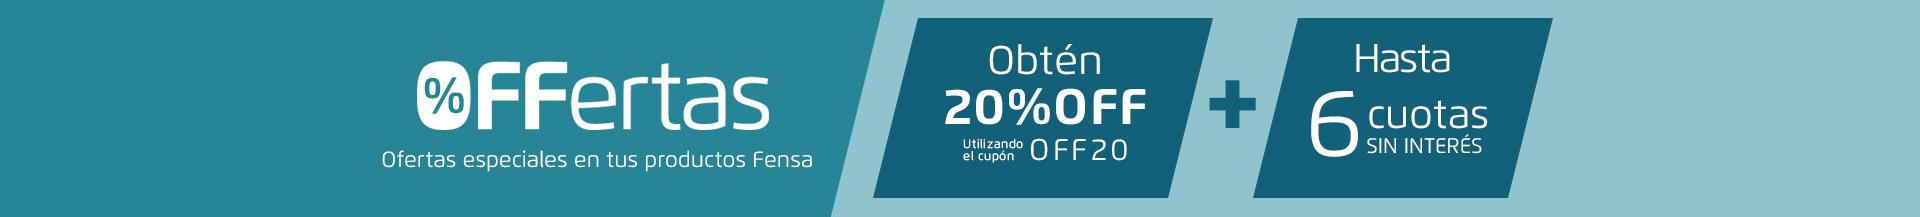 OFFerta 20% - Encimeras